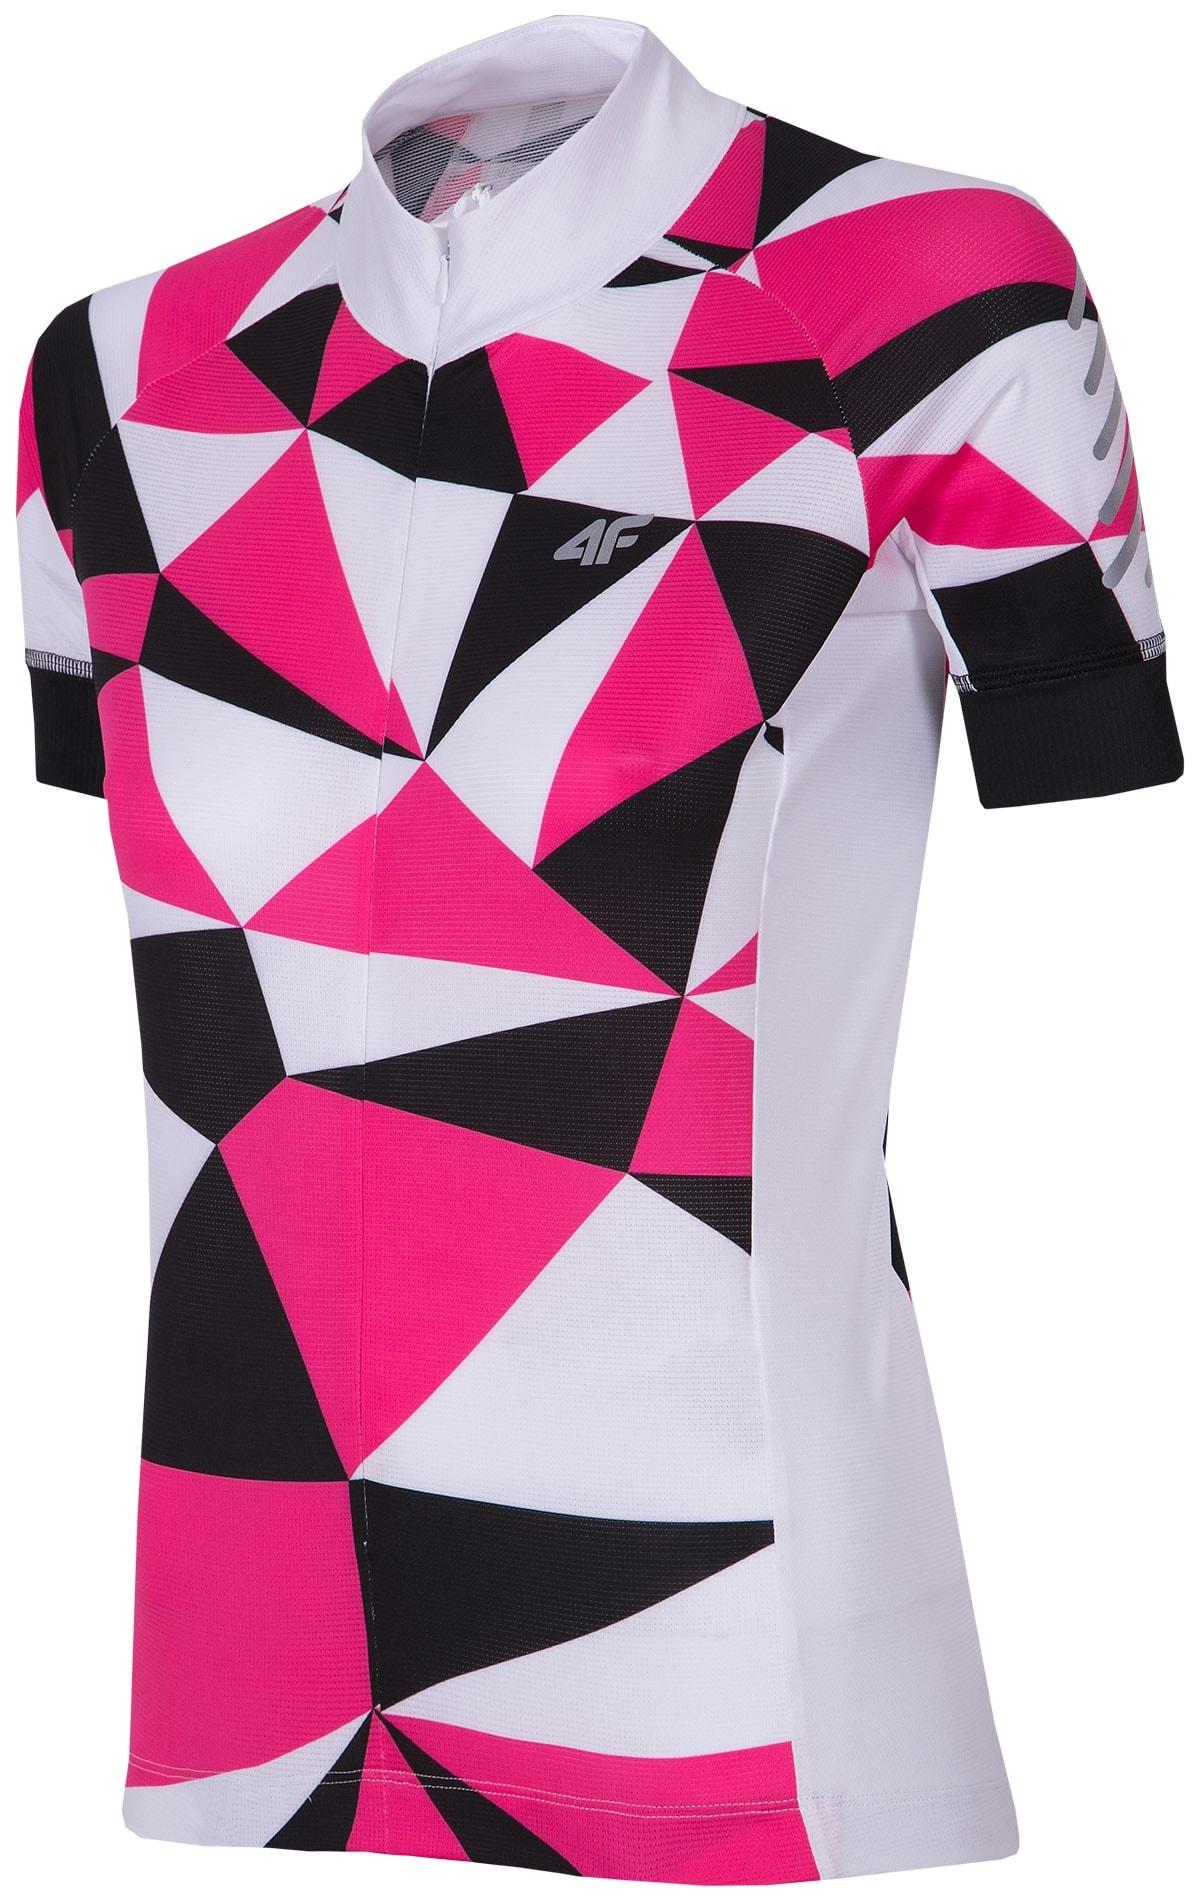 Koszulka rowerowa damska RKD153 - różowy